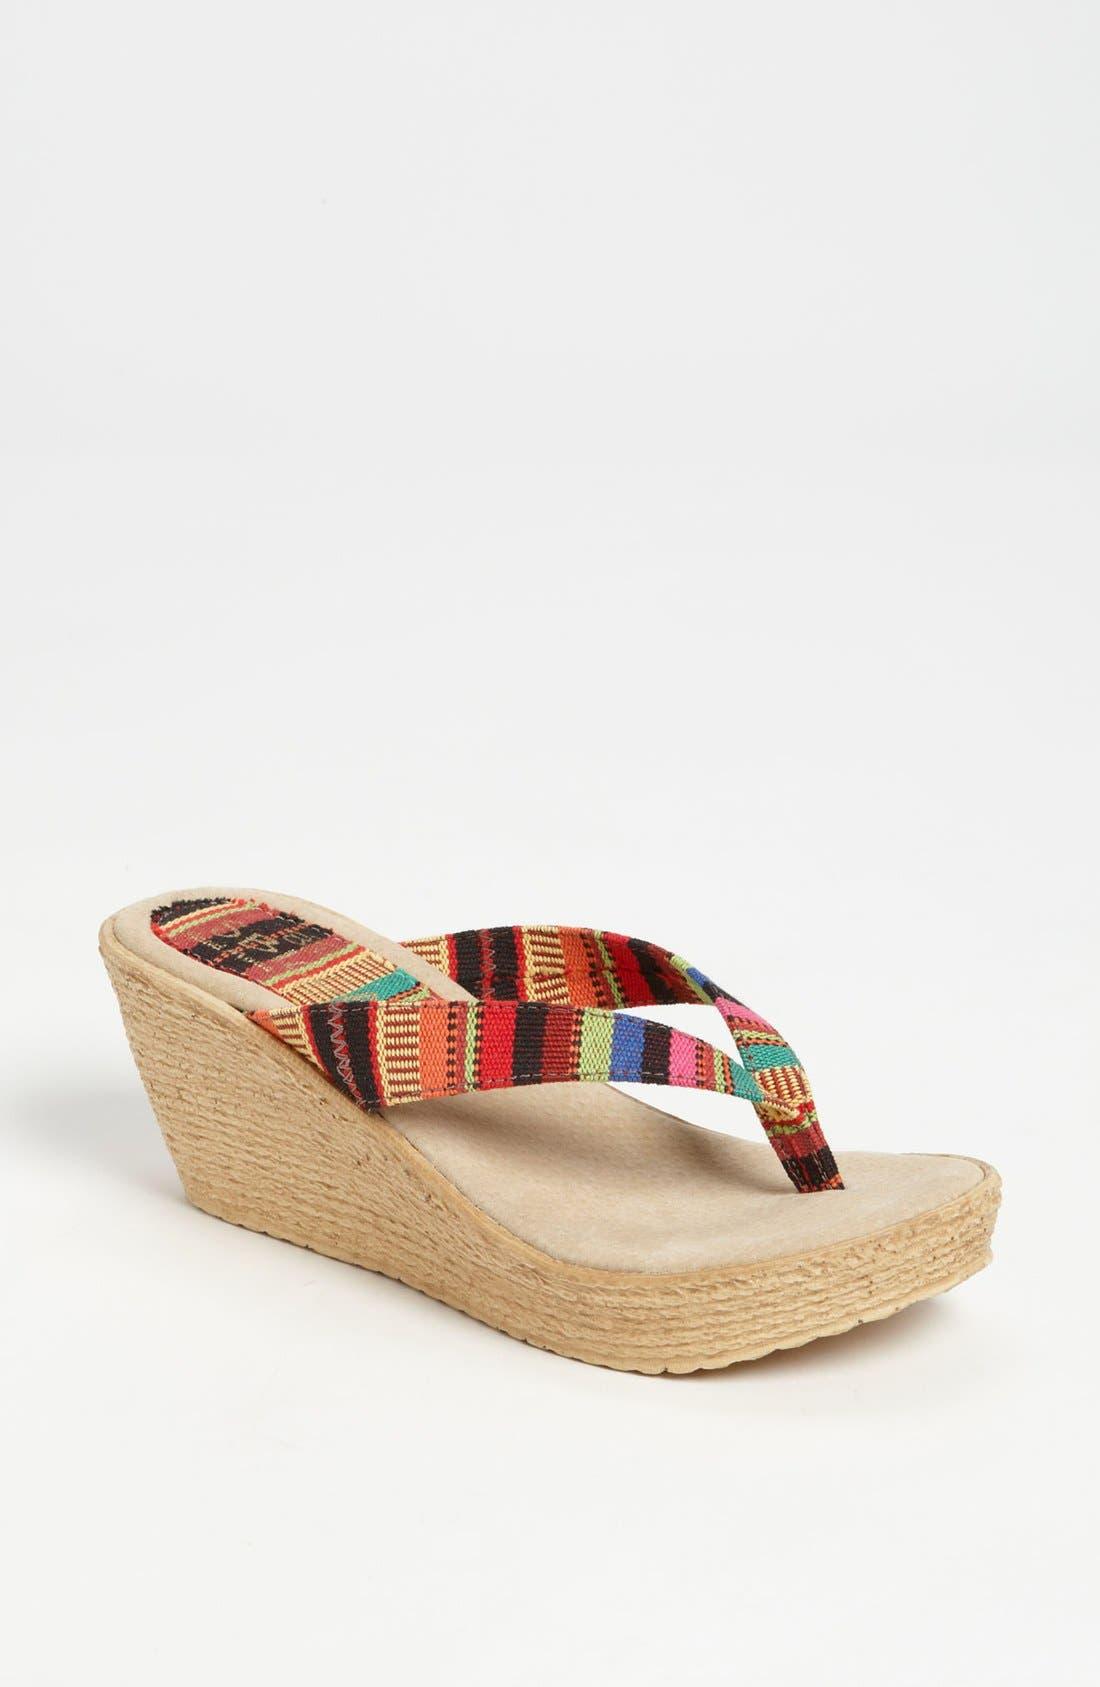 Alternate Image 1 Selected - Sbicca 'Andes' Wedge Sandal